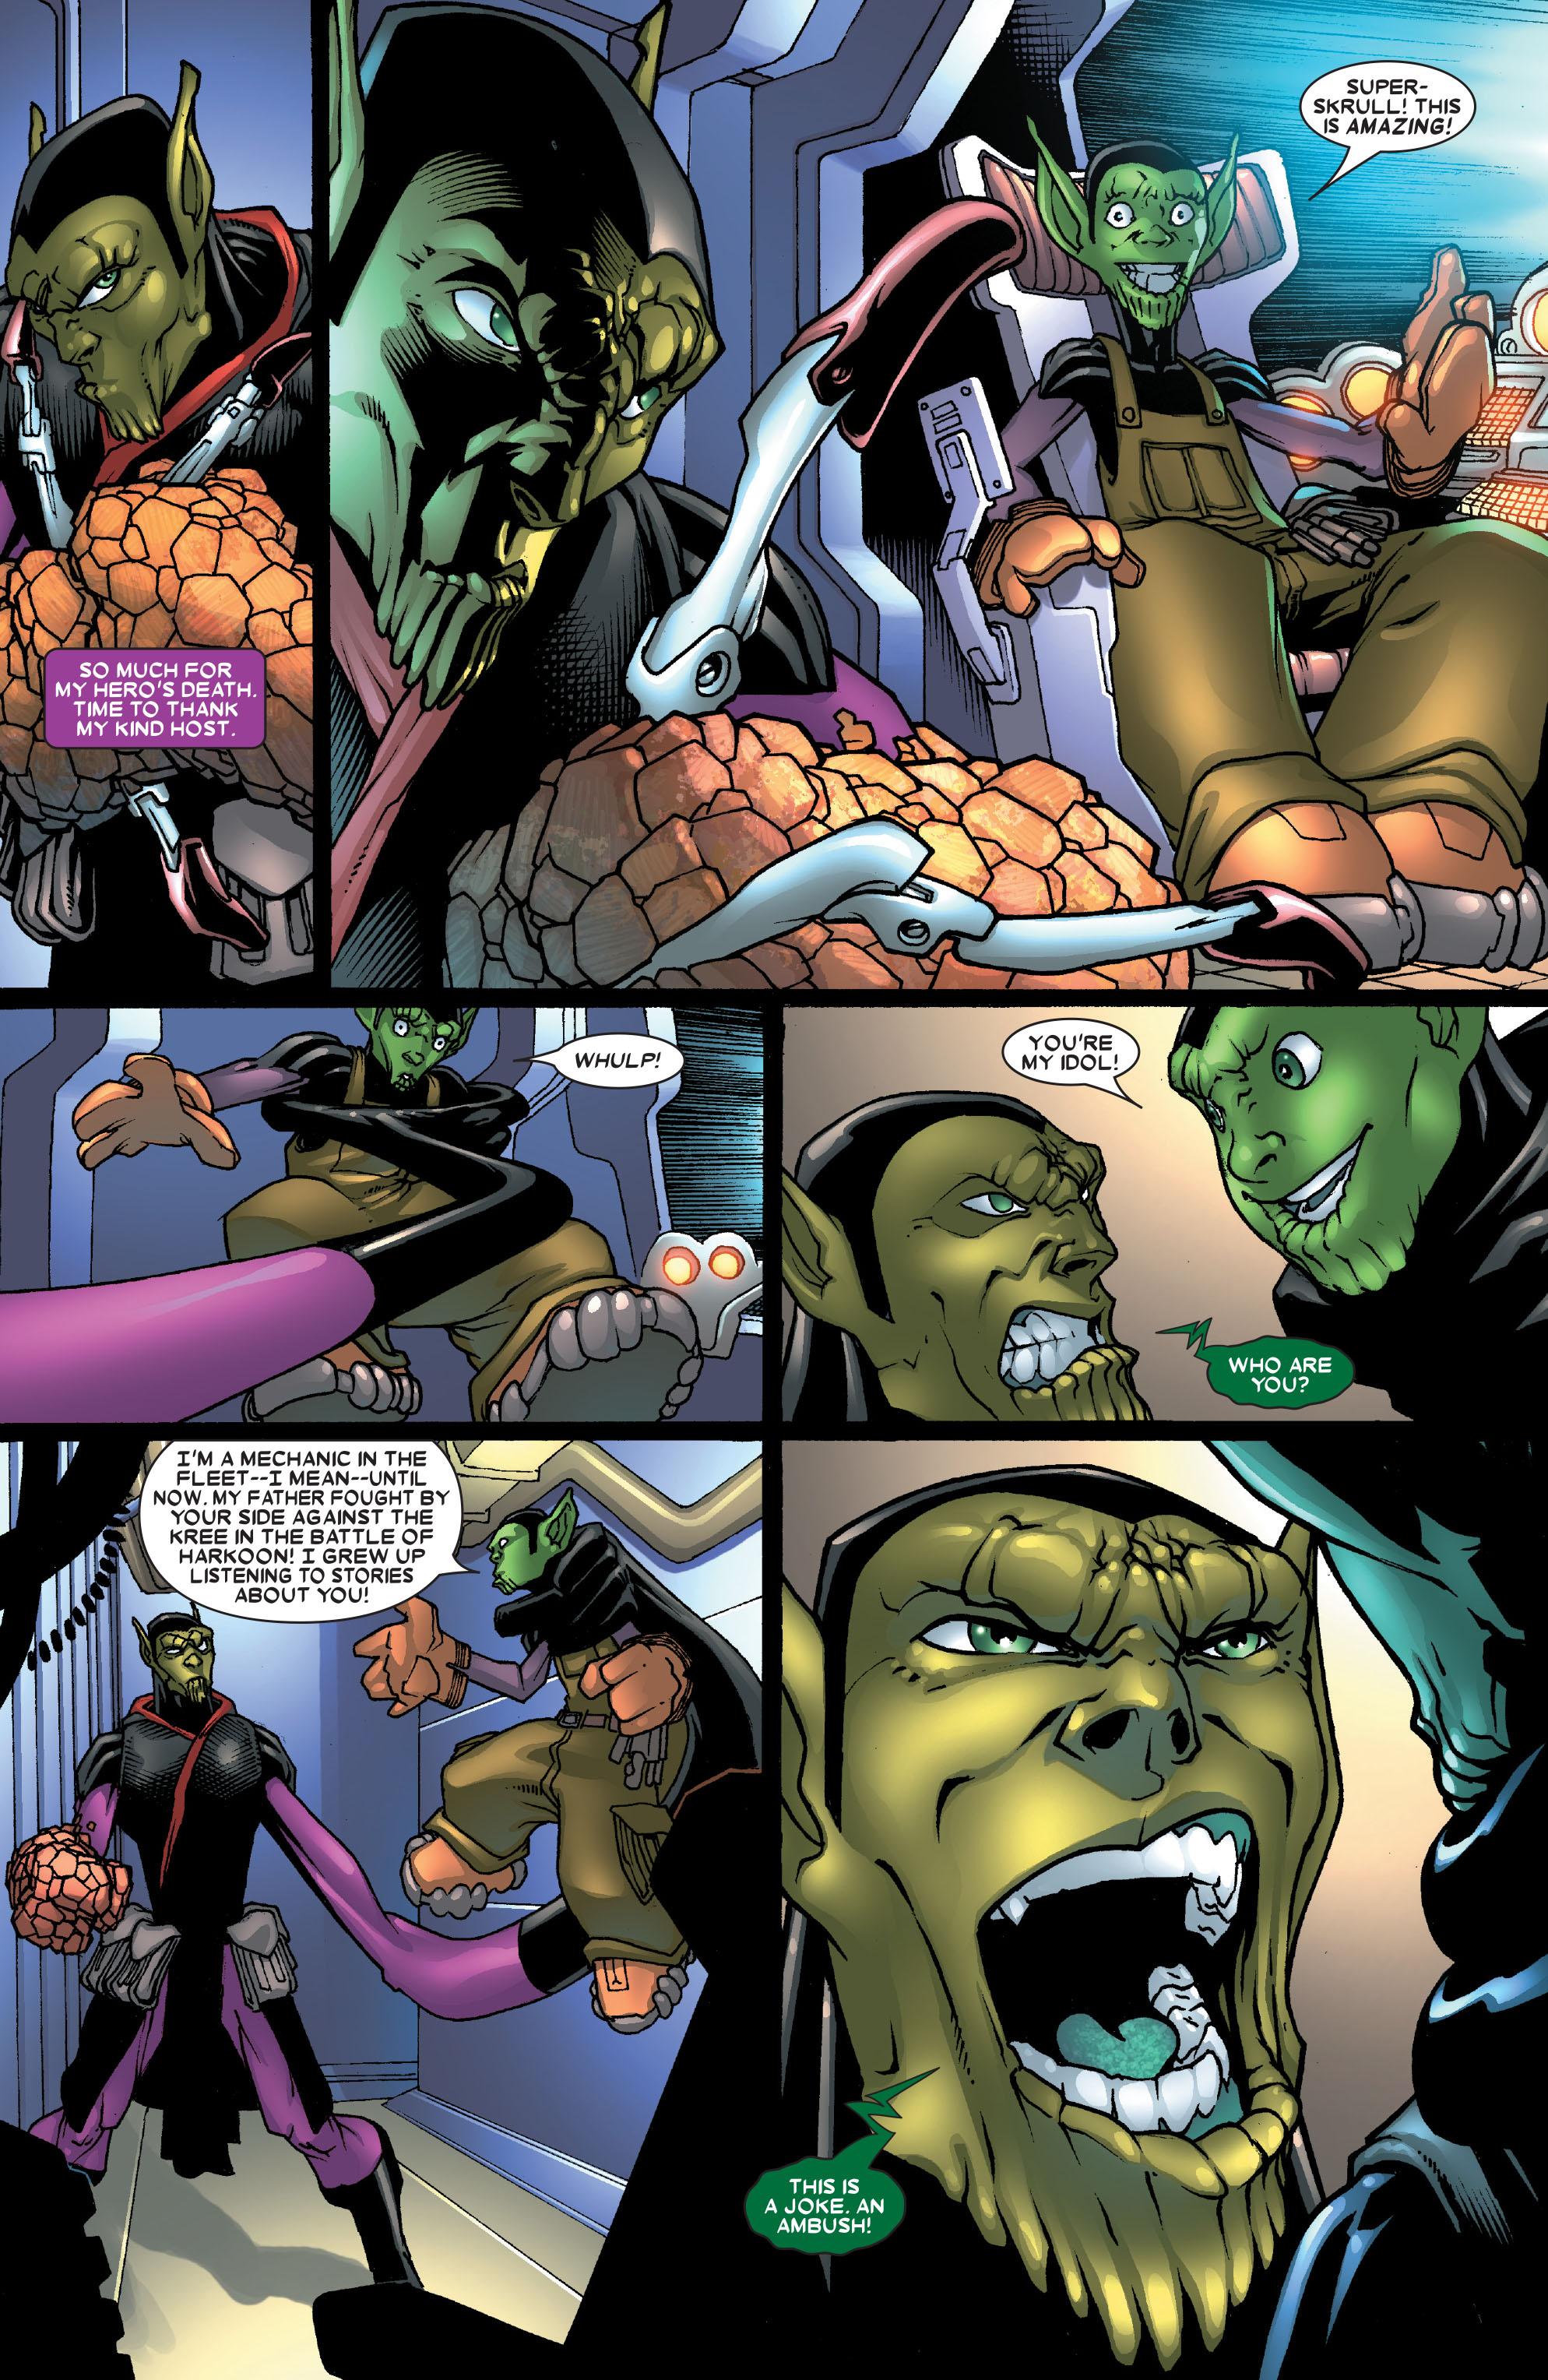 Read online Annihilation: Super-Skrull comic -  Issue #1 - 18